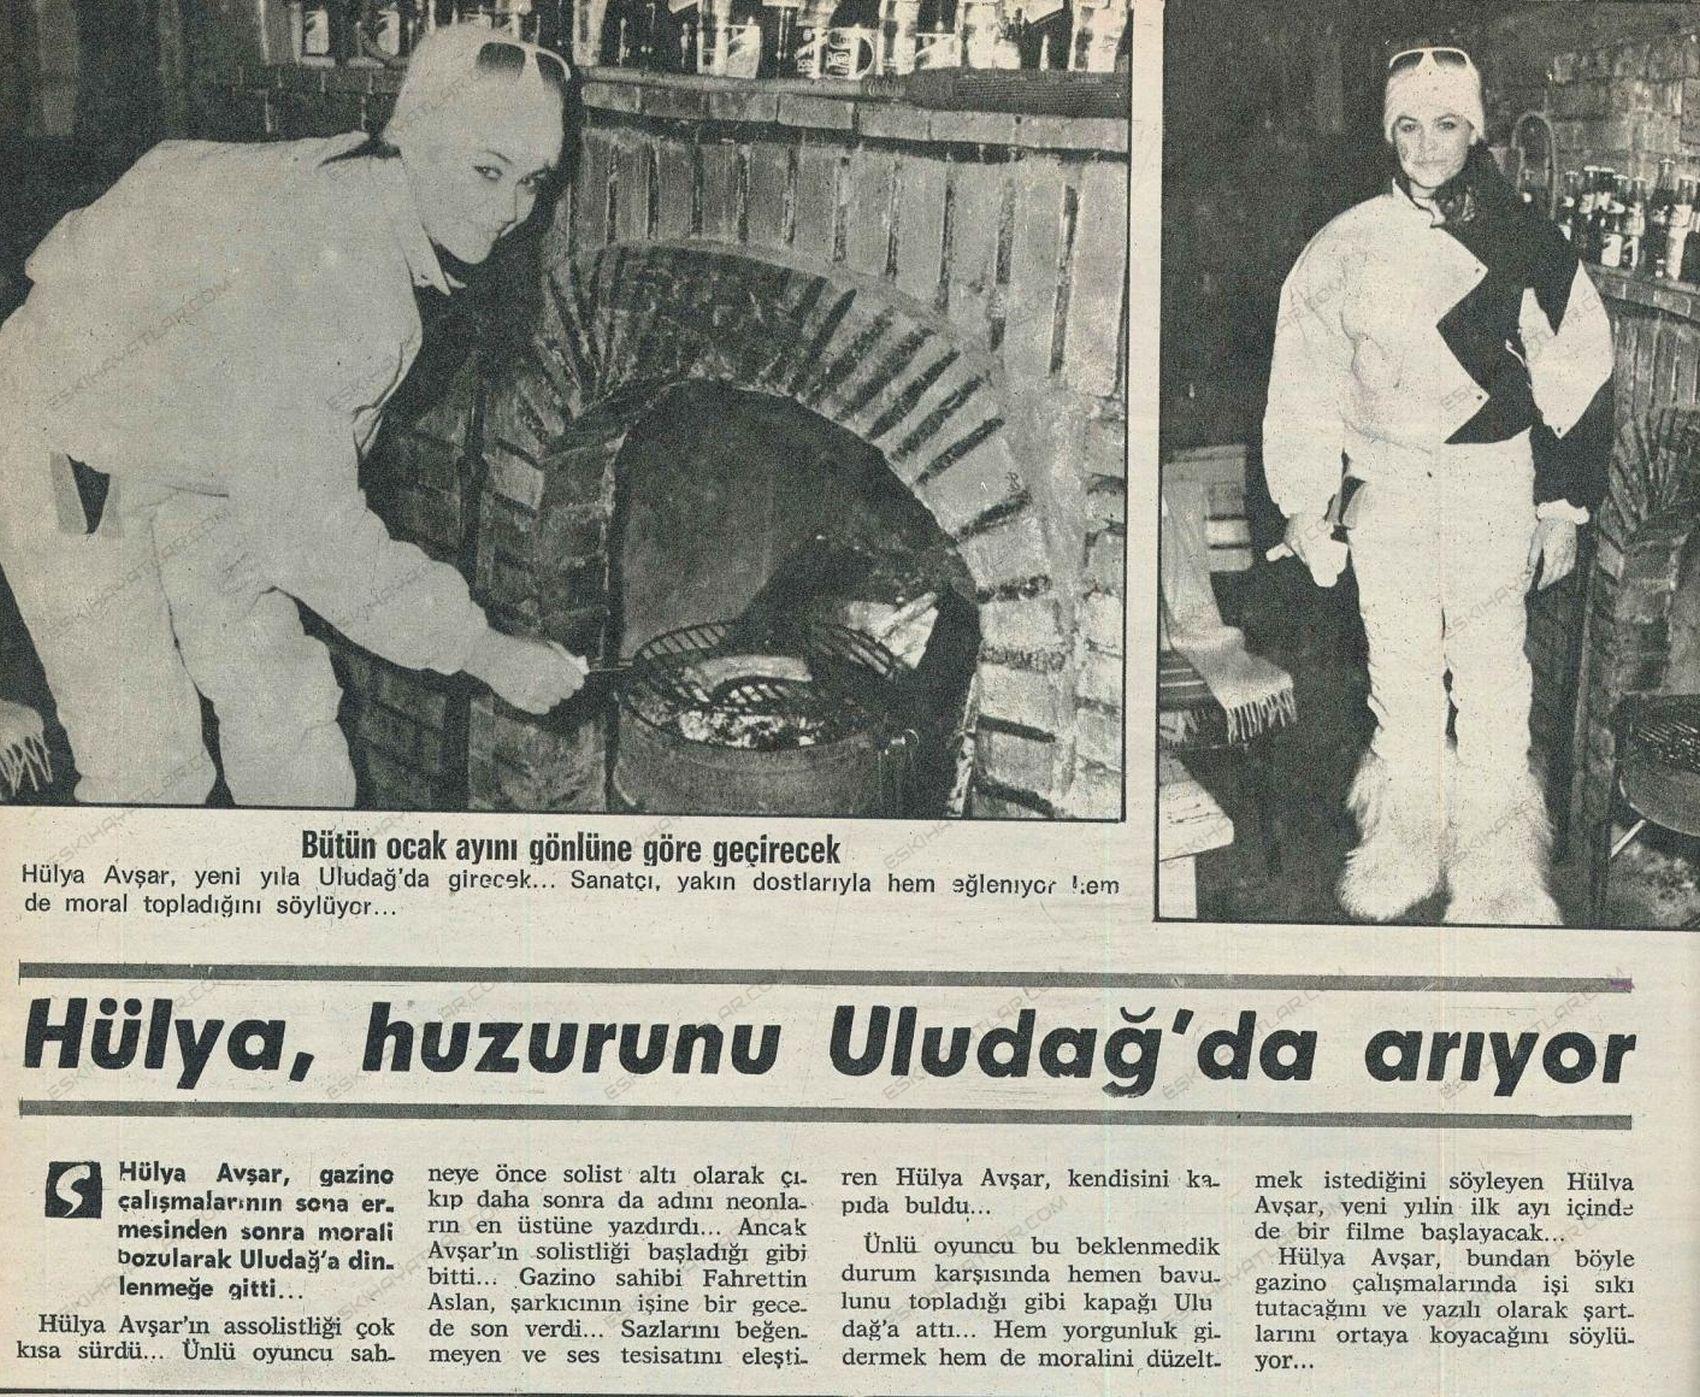 0346-hulya-avsar-1989-uludag-tatili-ses-dergisi